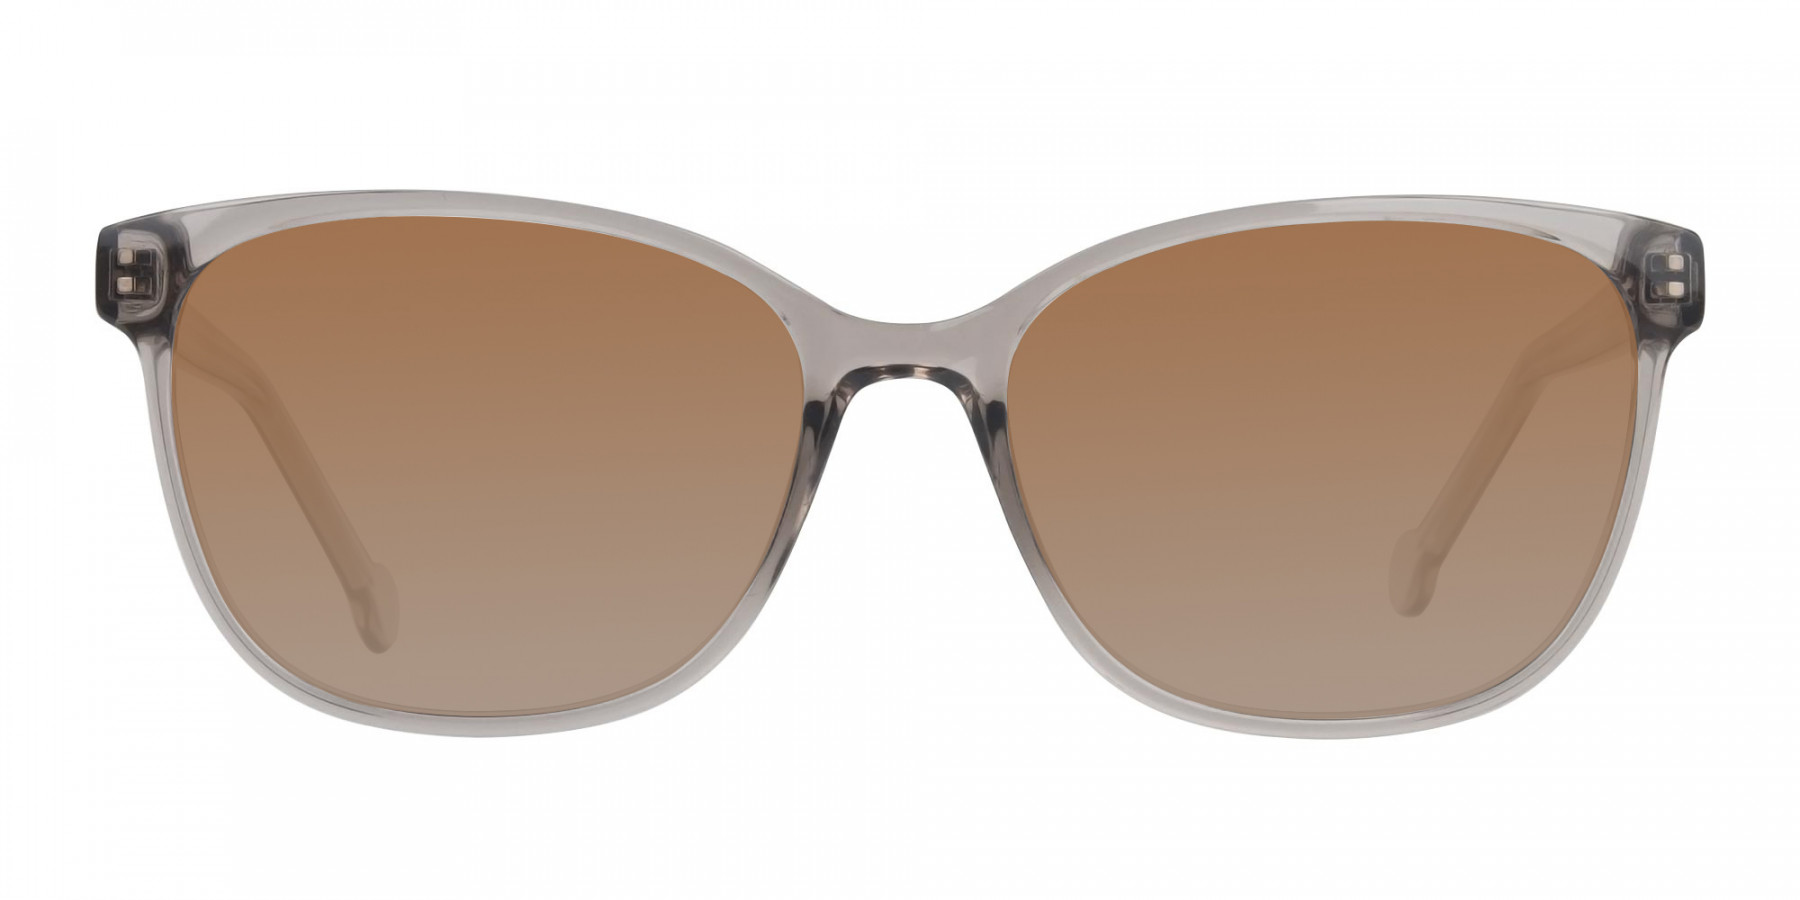 Crystal Grey Frame Sunglasses - 3